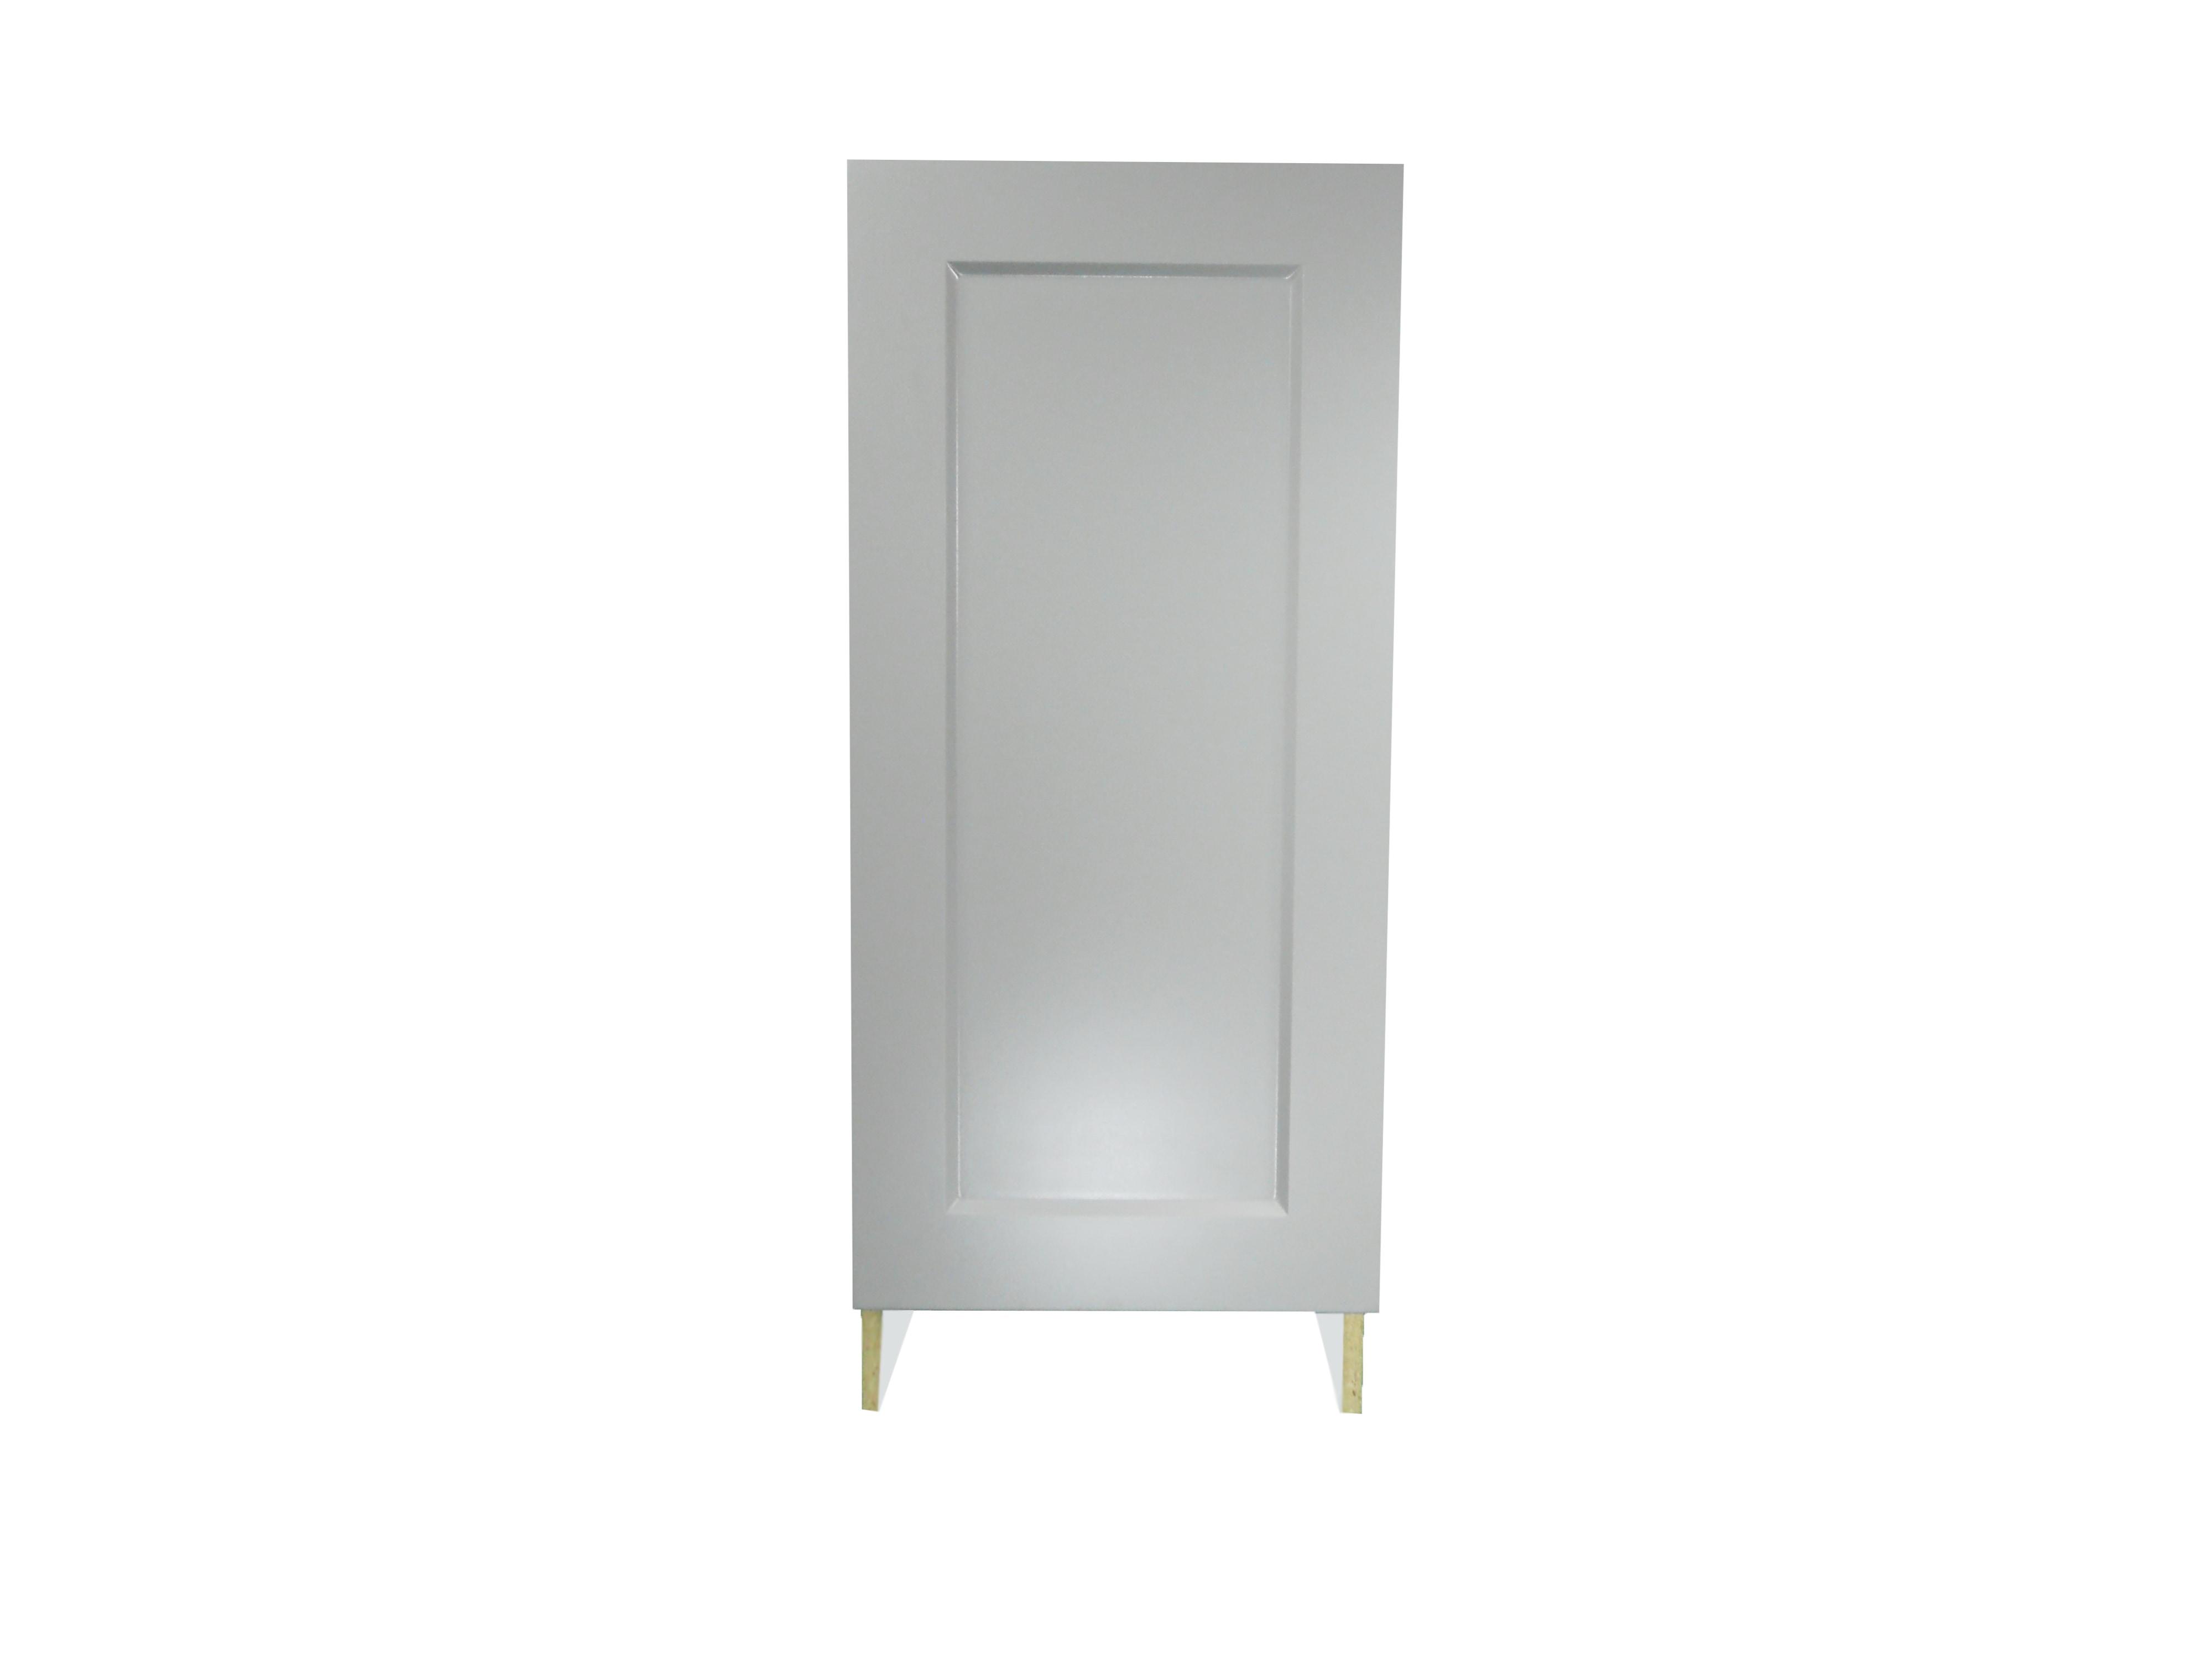 Base Cabinet With Door / Whistler Grey / Flat Panel Grey / 12 Whistler Grey 0